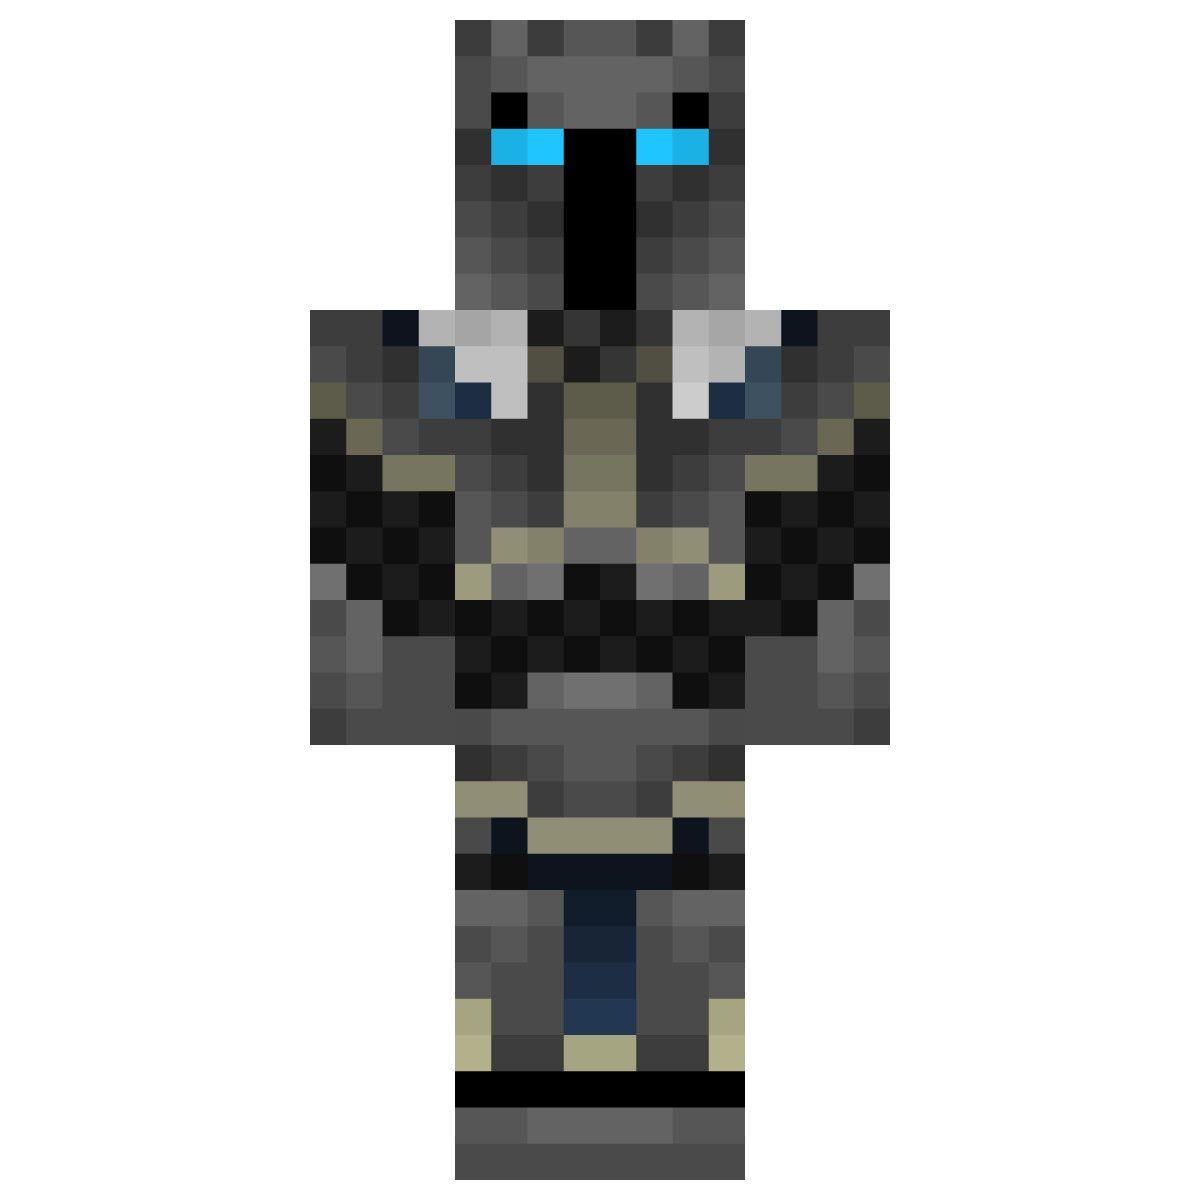 fa9cf5ba2 popularmmos | PopularMMOs - Minecraft Skin Finder - SeusCraft | The ...